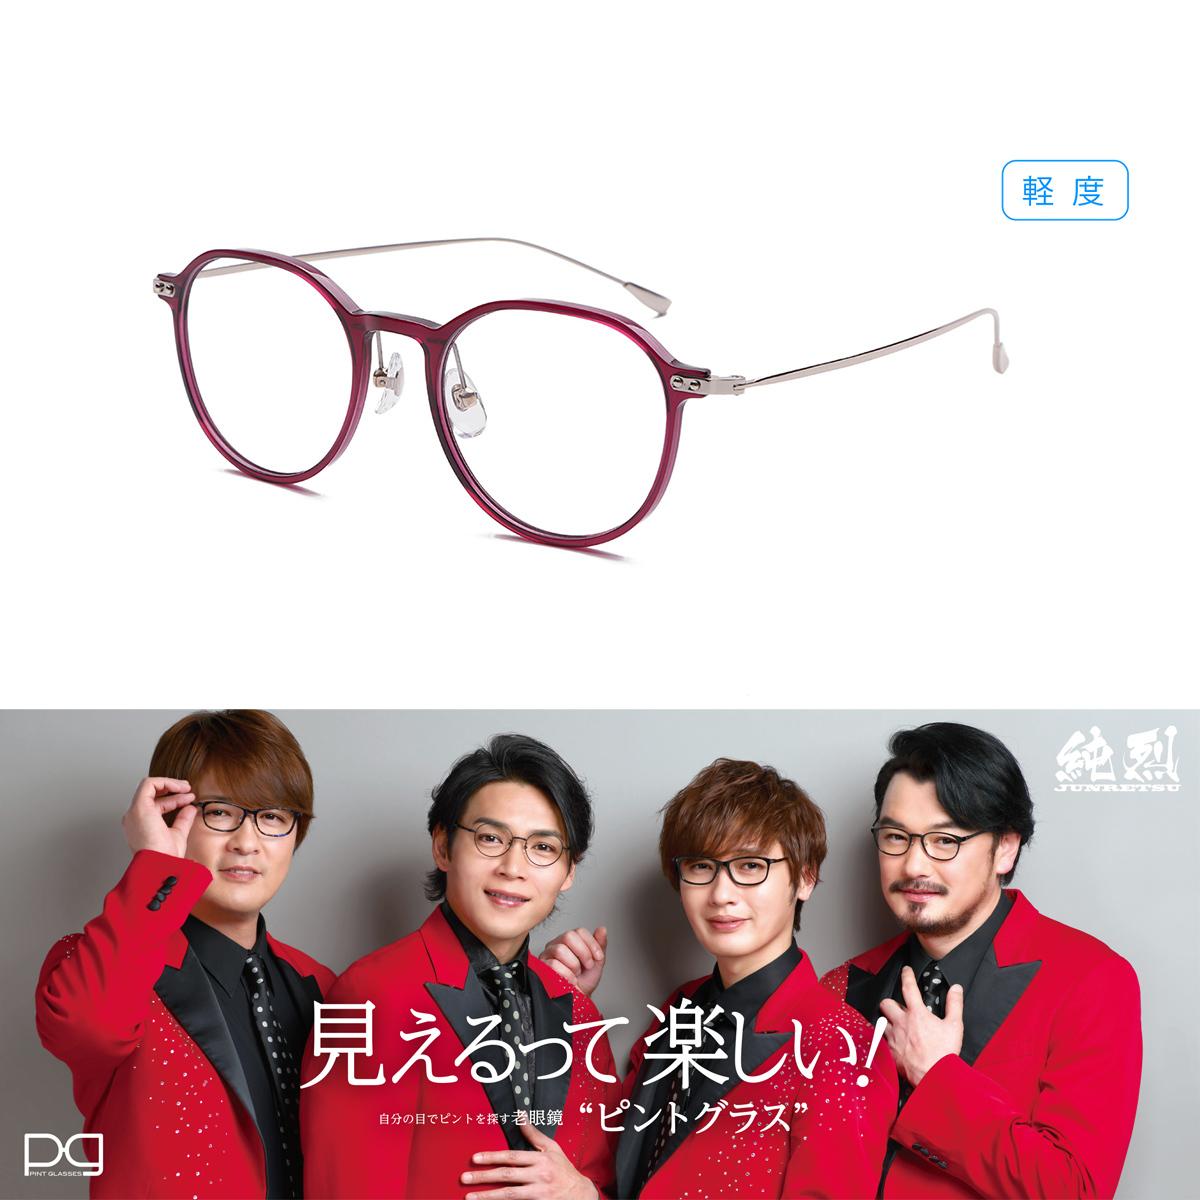 【PG-114L-PU】老眼鏡(ピントグラス)軽度レンズモデル パープル